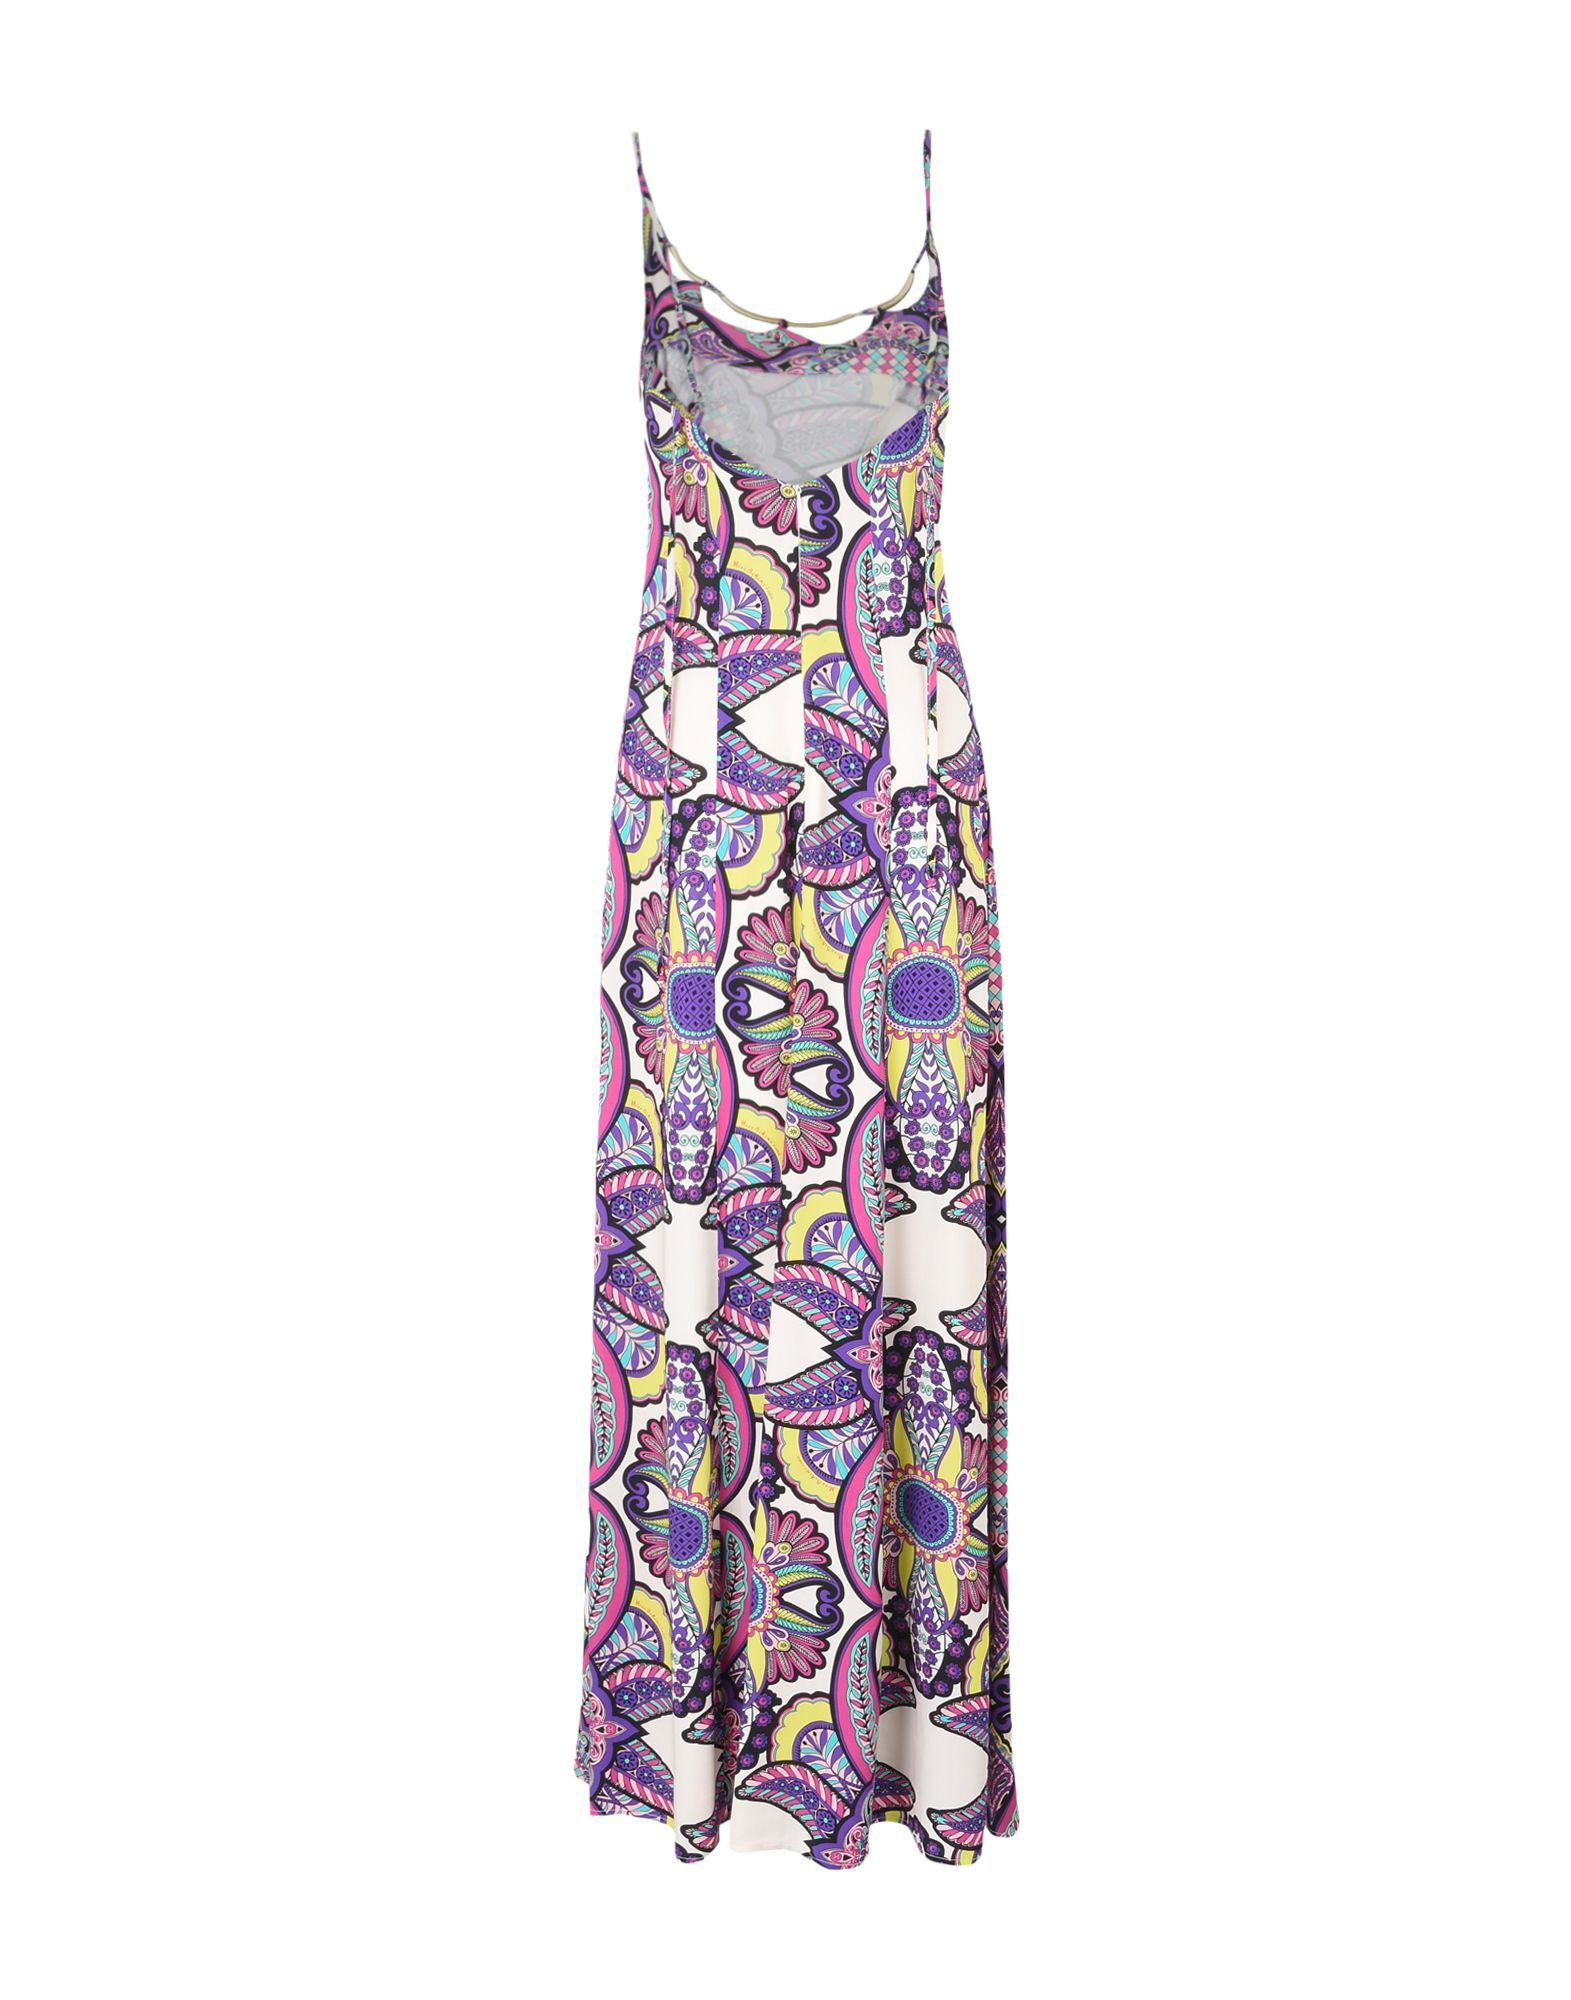 DRESSES Miss Bikini Luxe Purple Woman Viscose